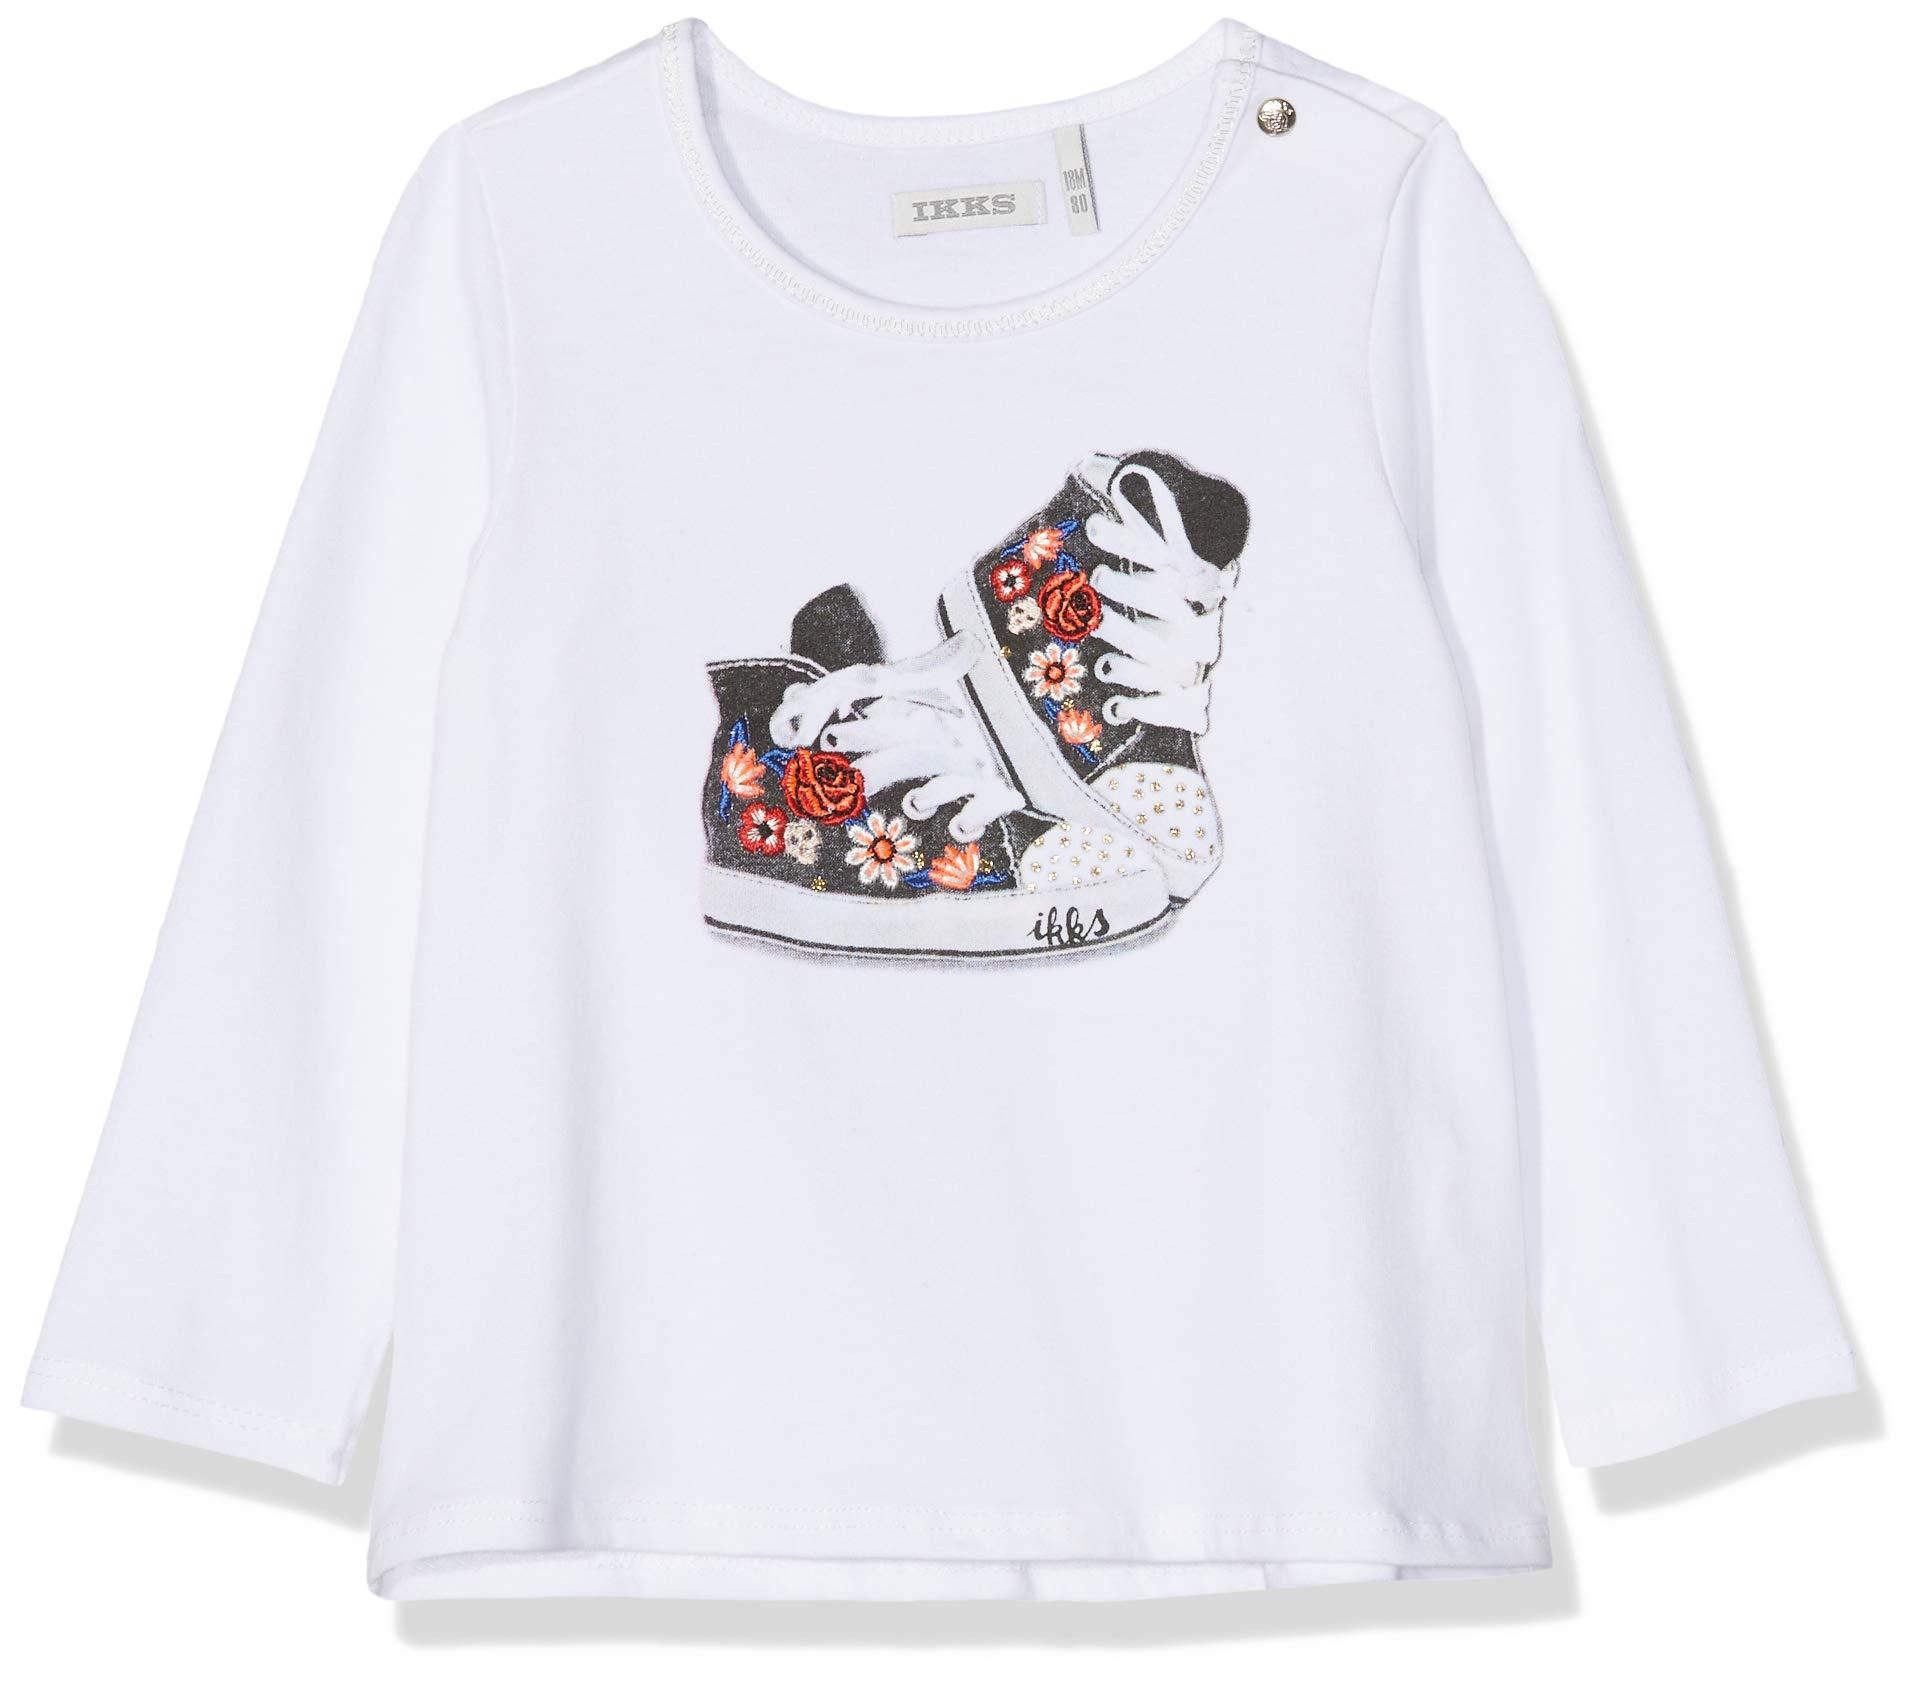 IKKS Junior tee Shirt Ml Basket Fleurie Camiseta para Bebés 1